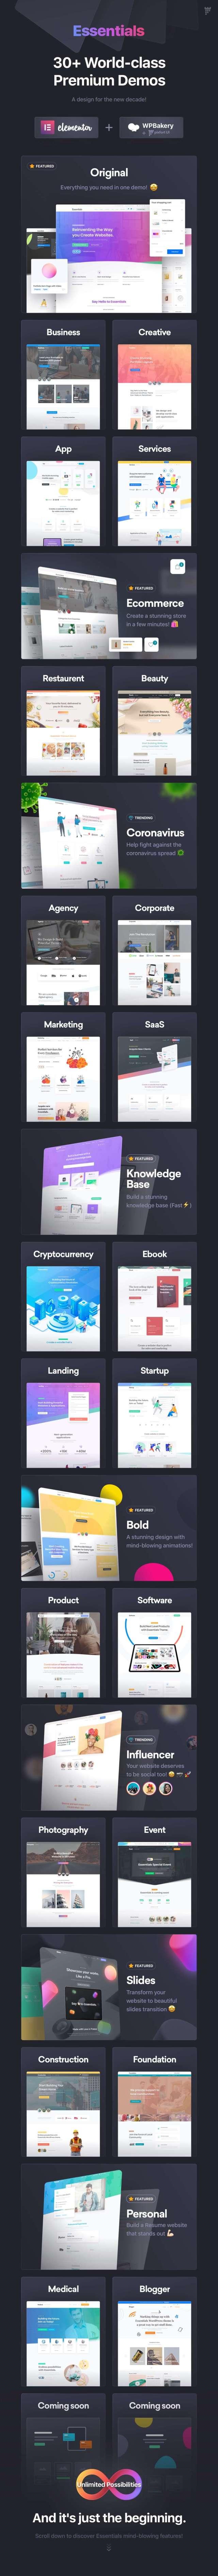 Essentials | Multipurpose WordPress Theme - 21